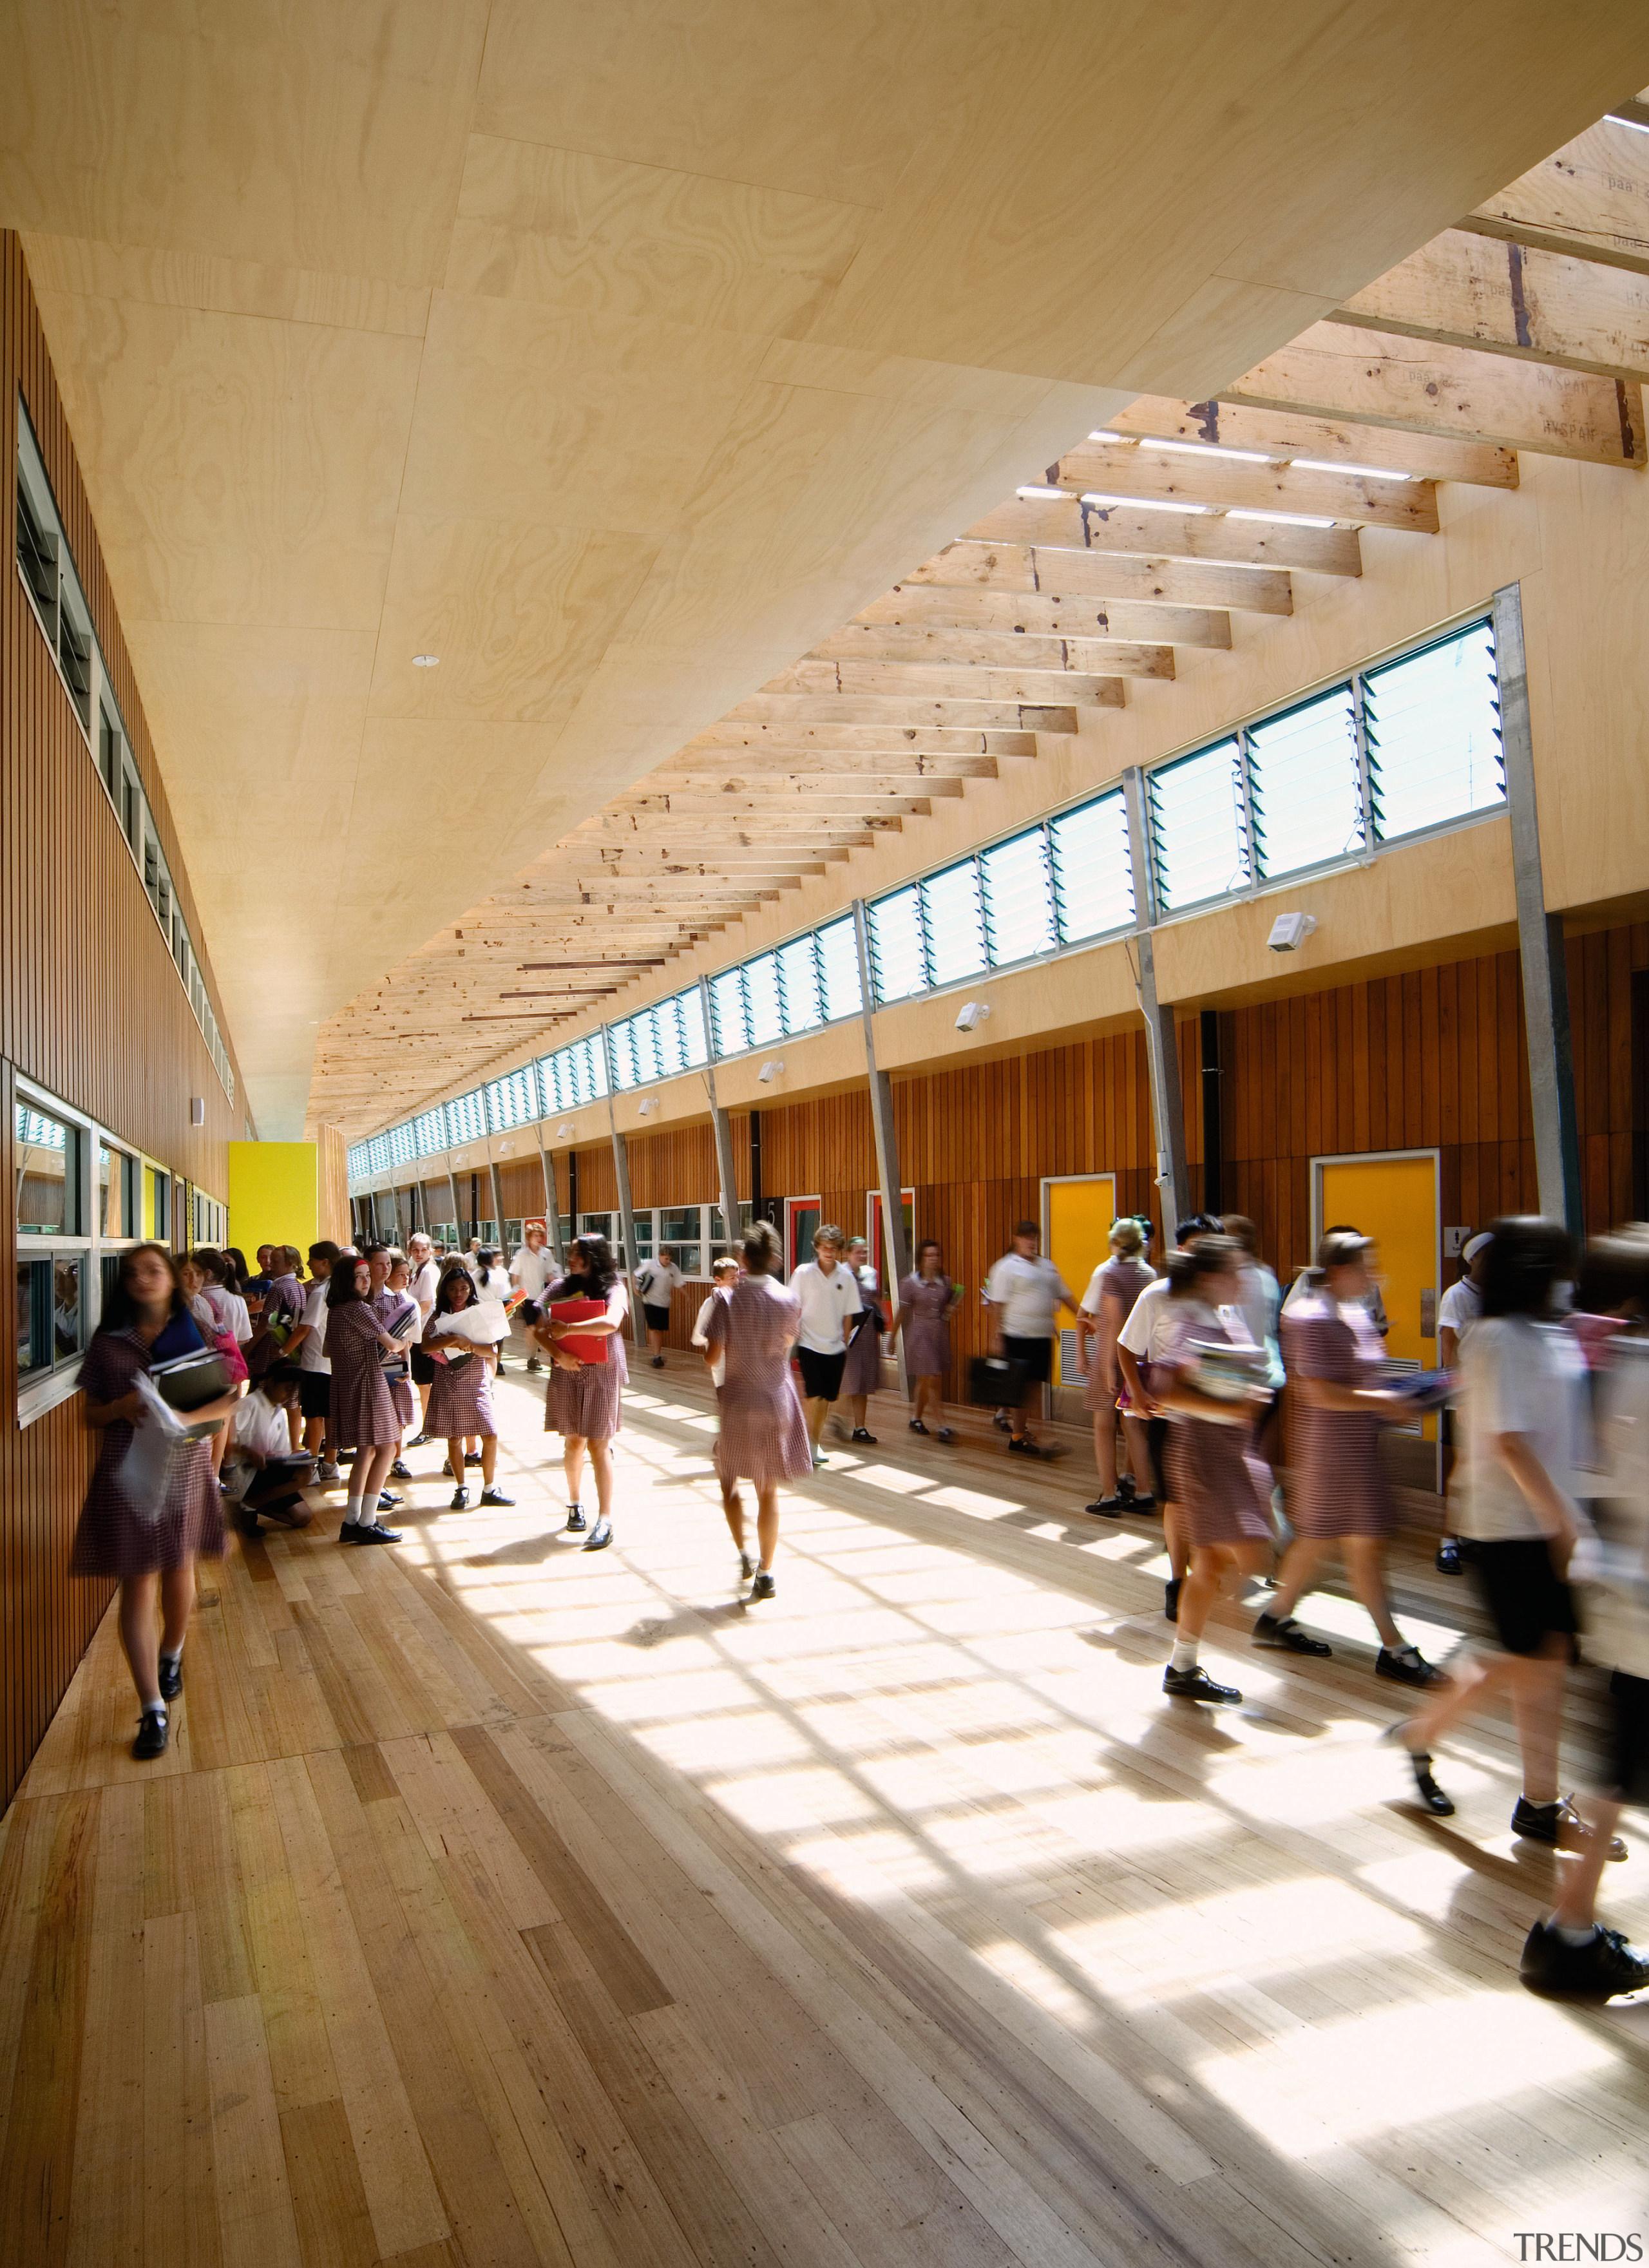 View of Williamstown High School in Melbourne. Designed wood, brown, orange